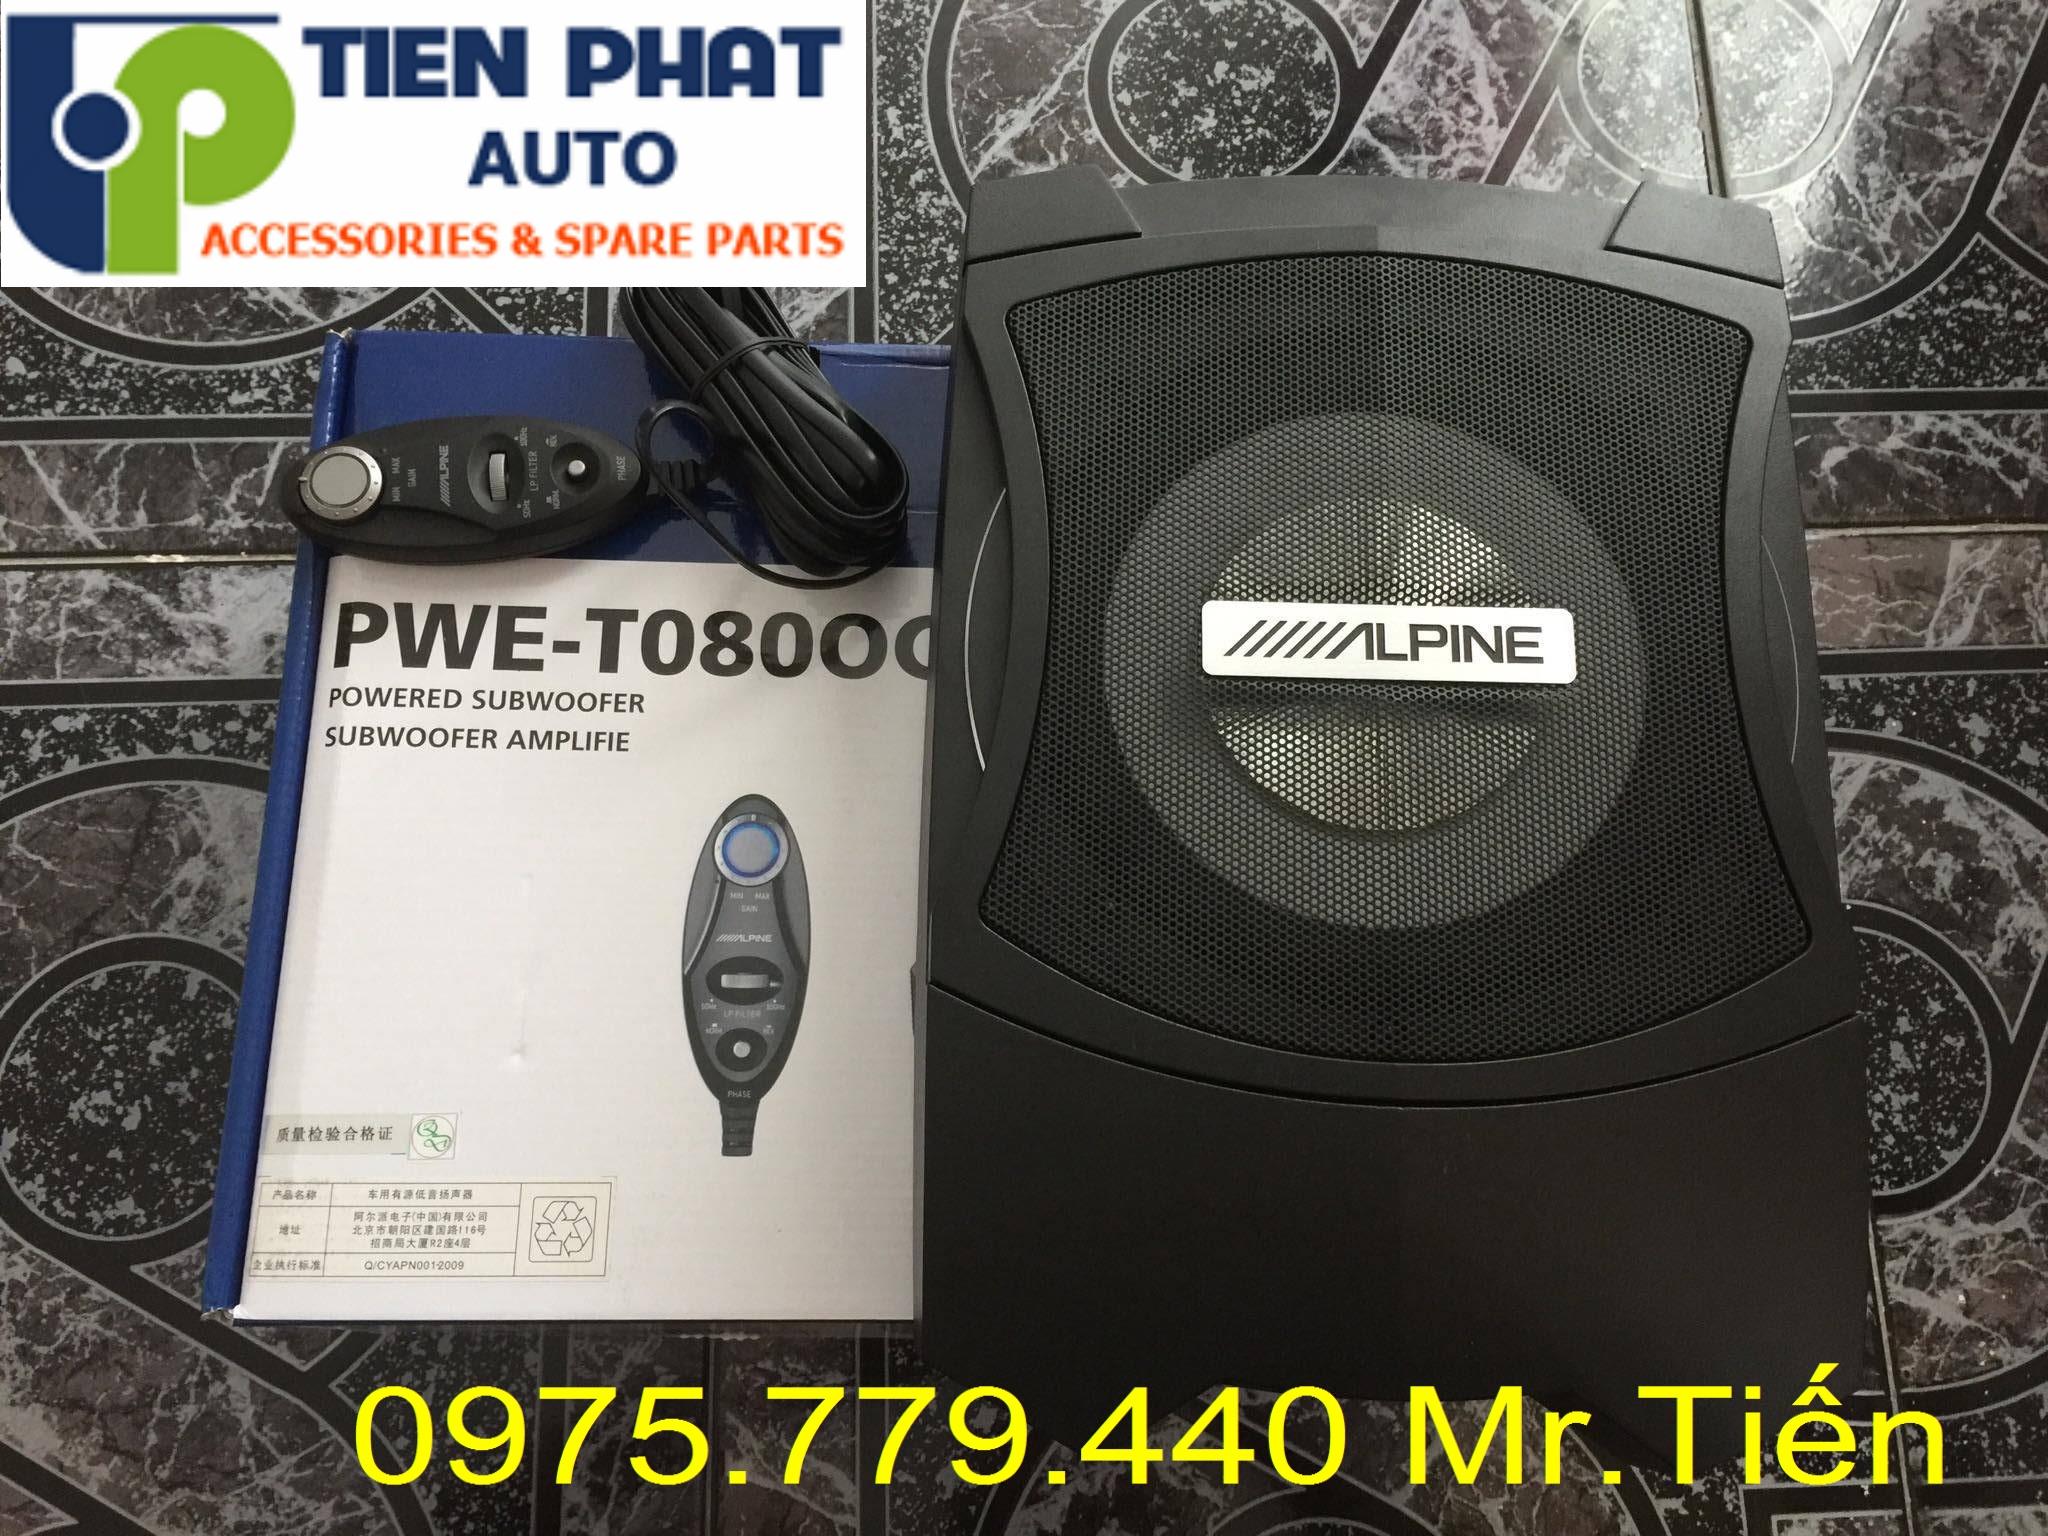 Lắp Loa sub Alpine PWE-T0800C cho Mazda 3 Lắp Đặt Tận Nơi